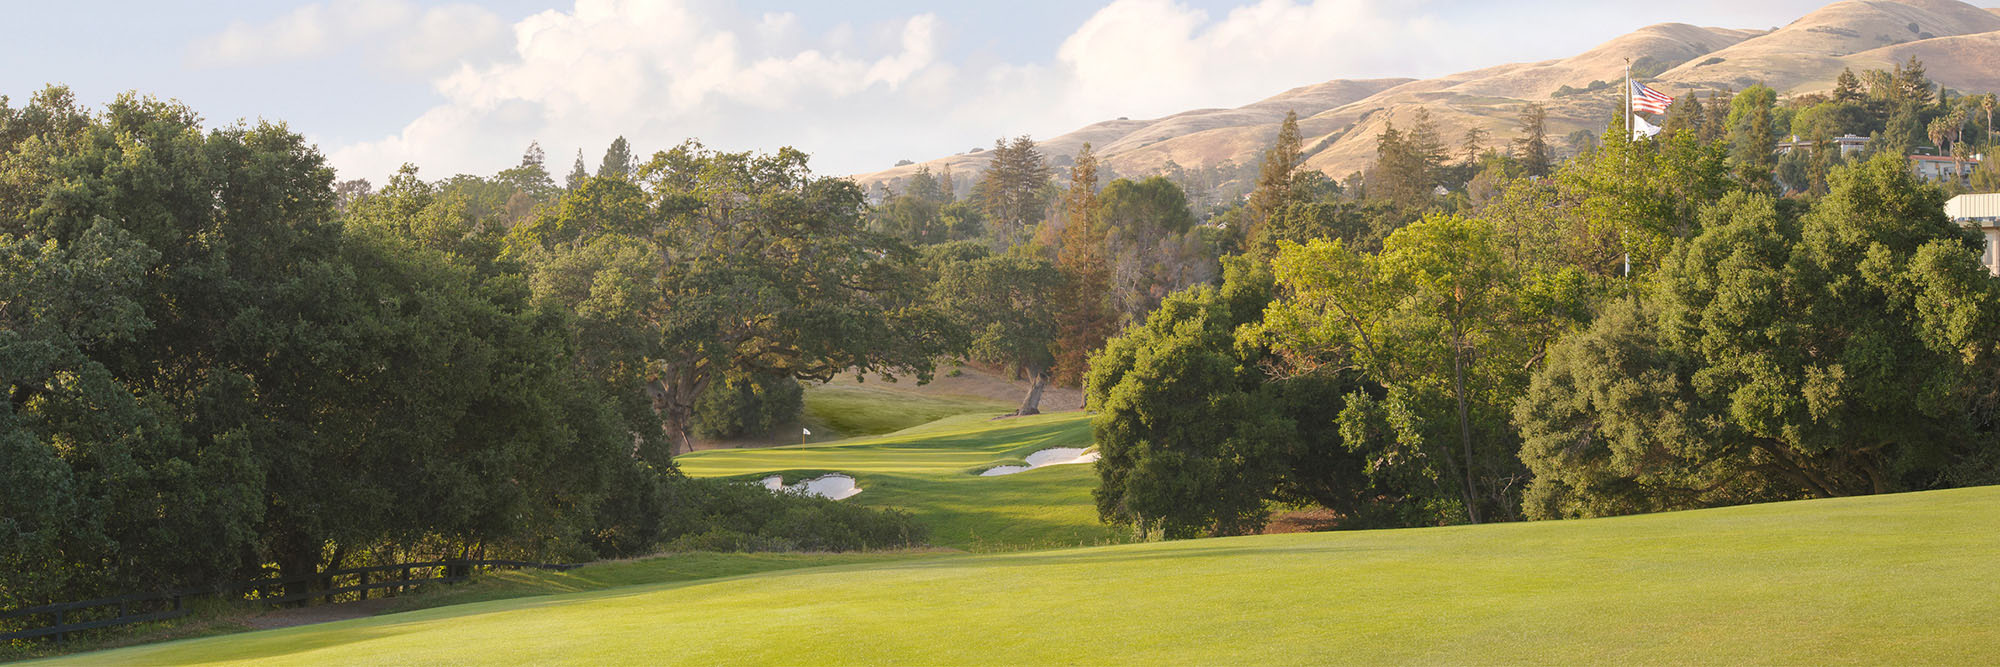 Golf Course Image - San Jose Country Club No. 18